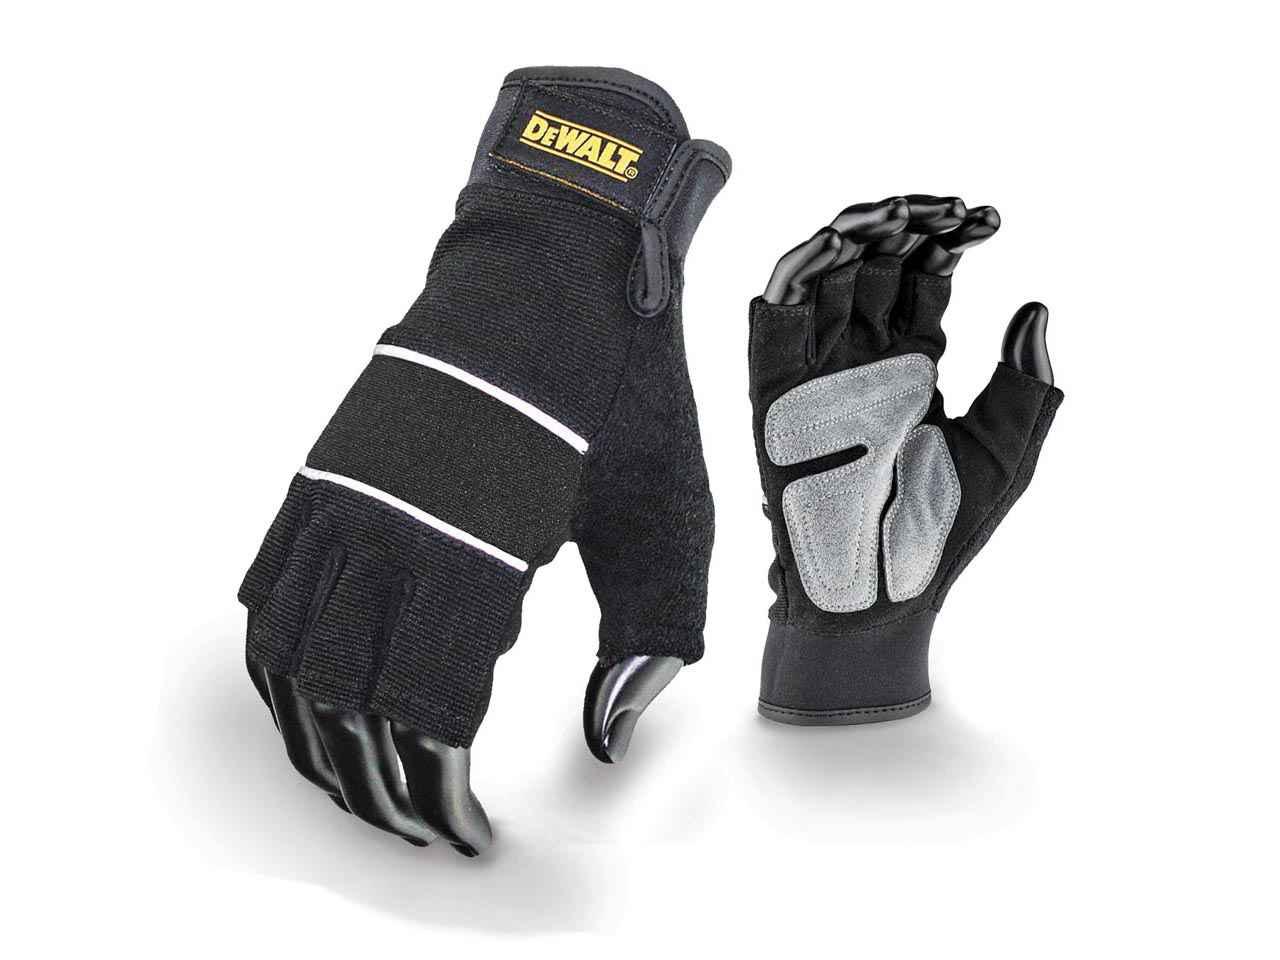 Vitrex 337200 Large//X-Large Premium Builders Grip Glove